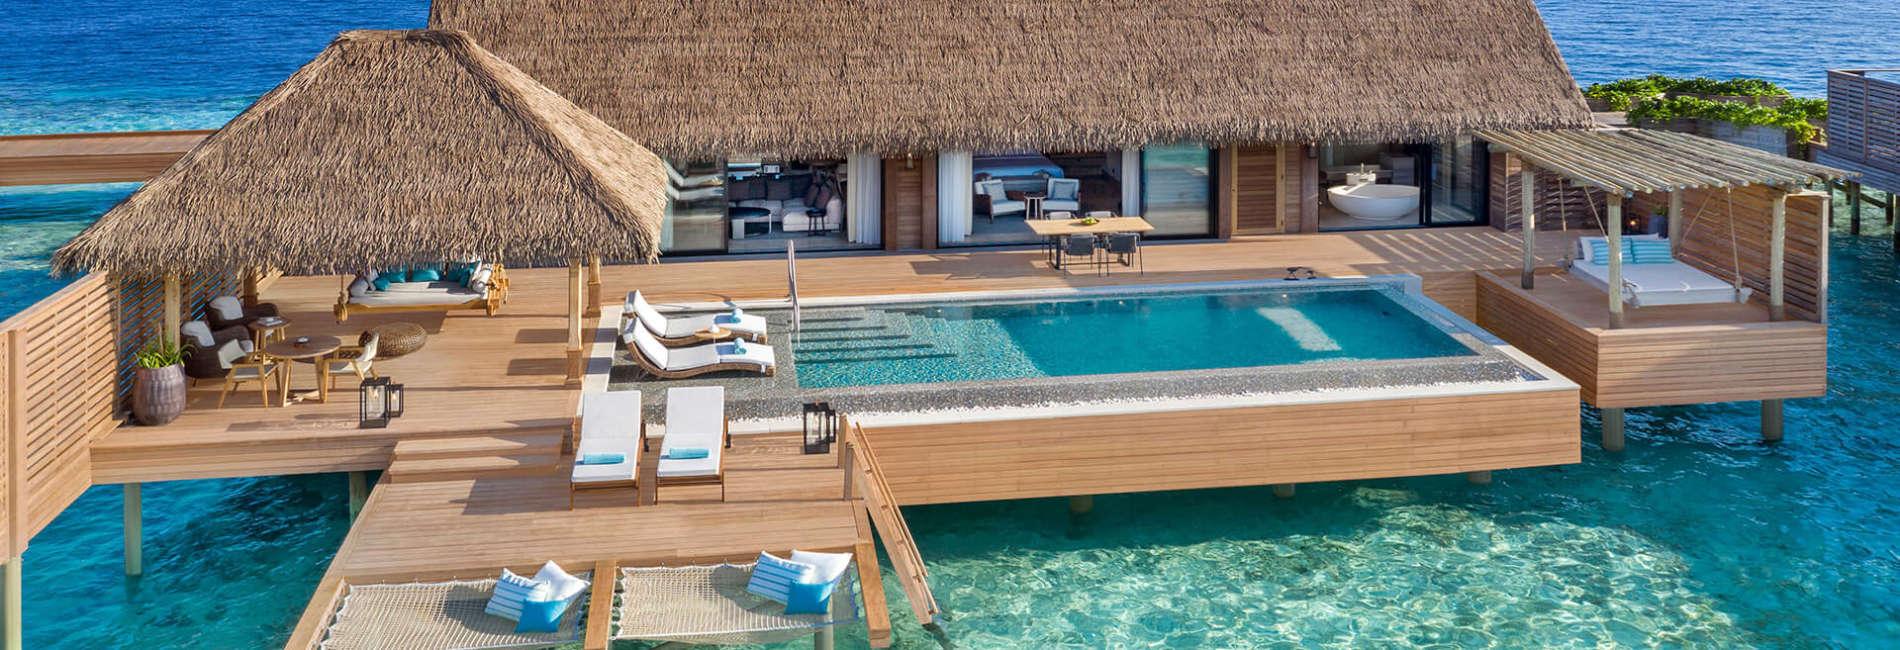 Grand Over Water Villa with Pool Waldorf Astoria Maldives Ithaafushi